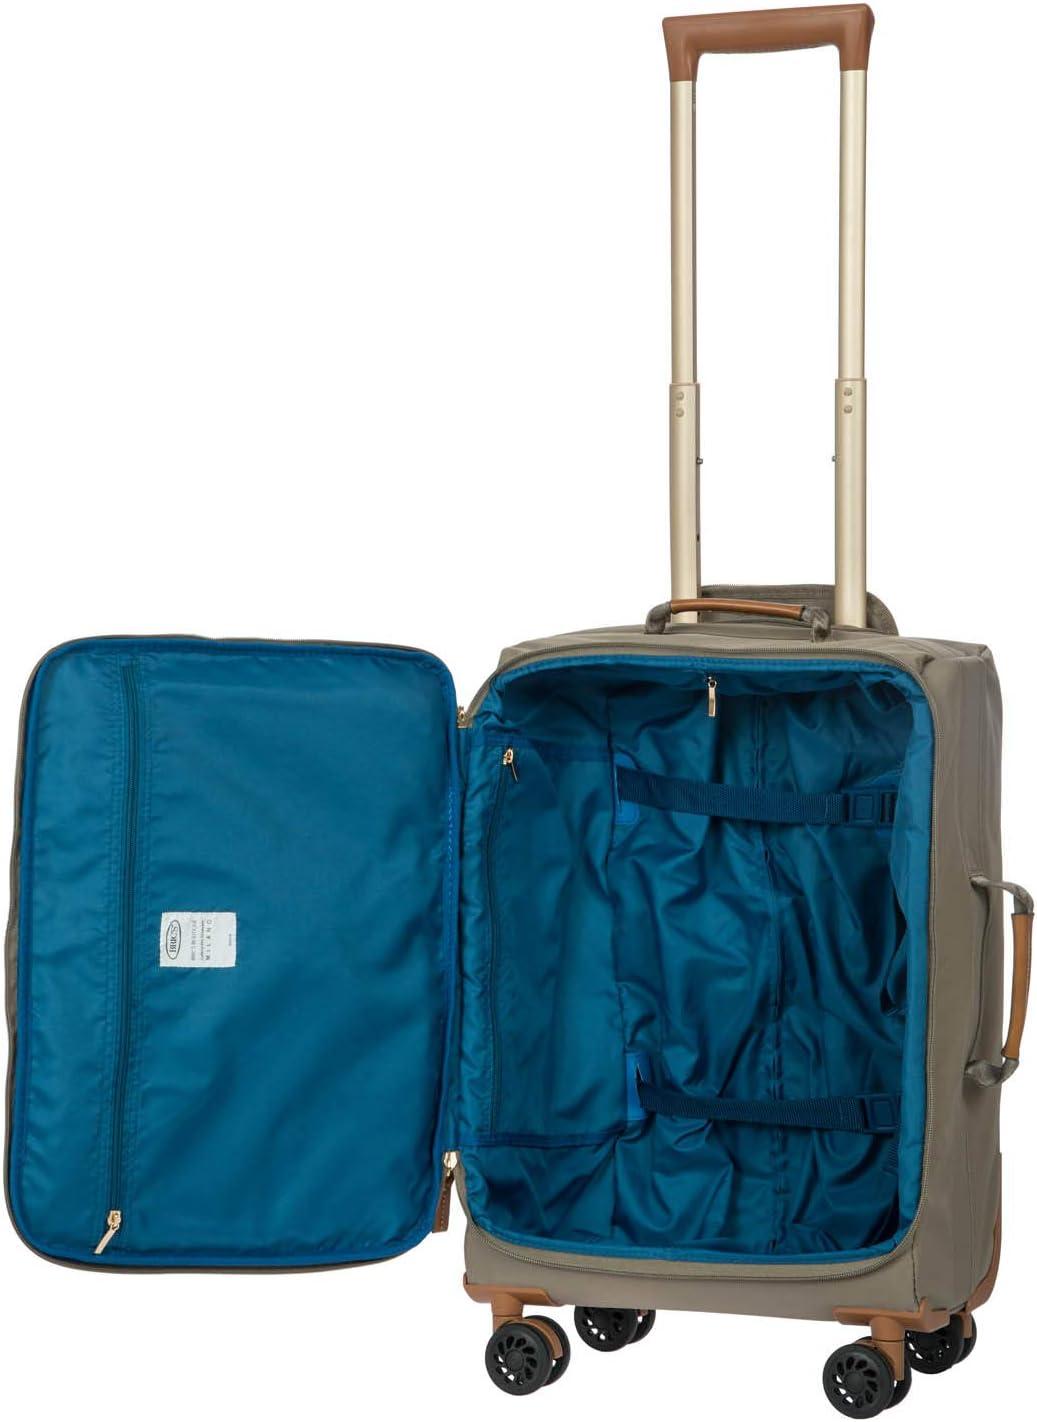 Brics X-Bag//x-Travel 21 Inch International Carry On Spinner W//Frame Dove Grey